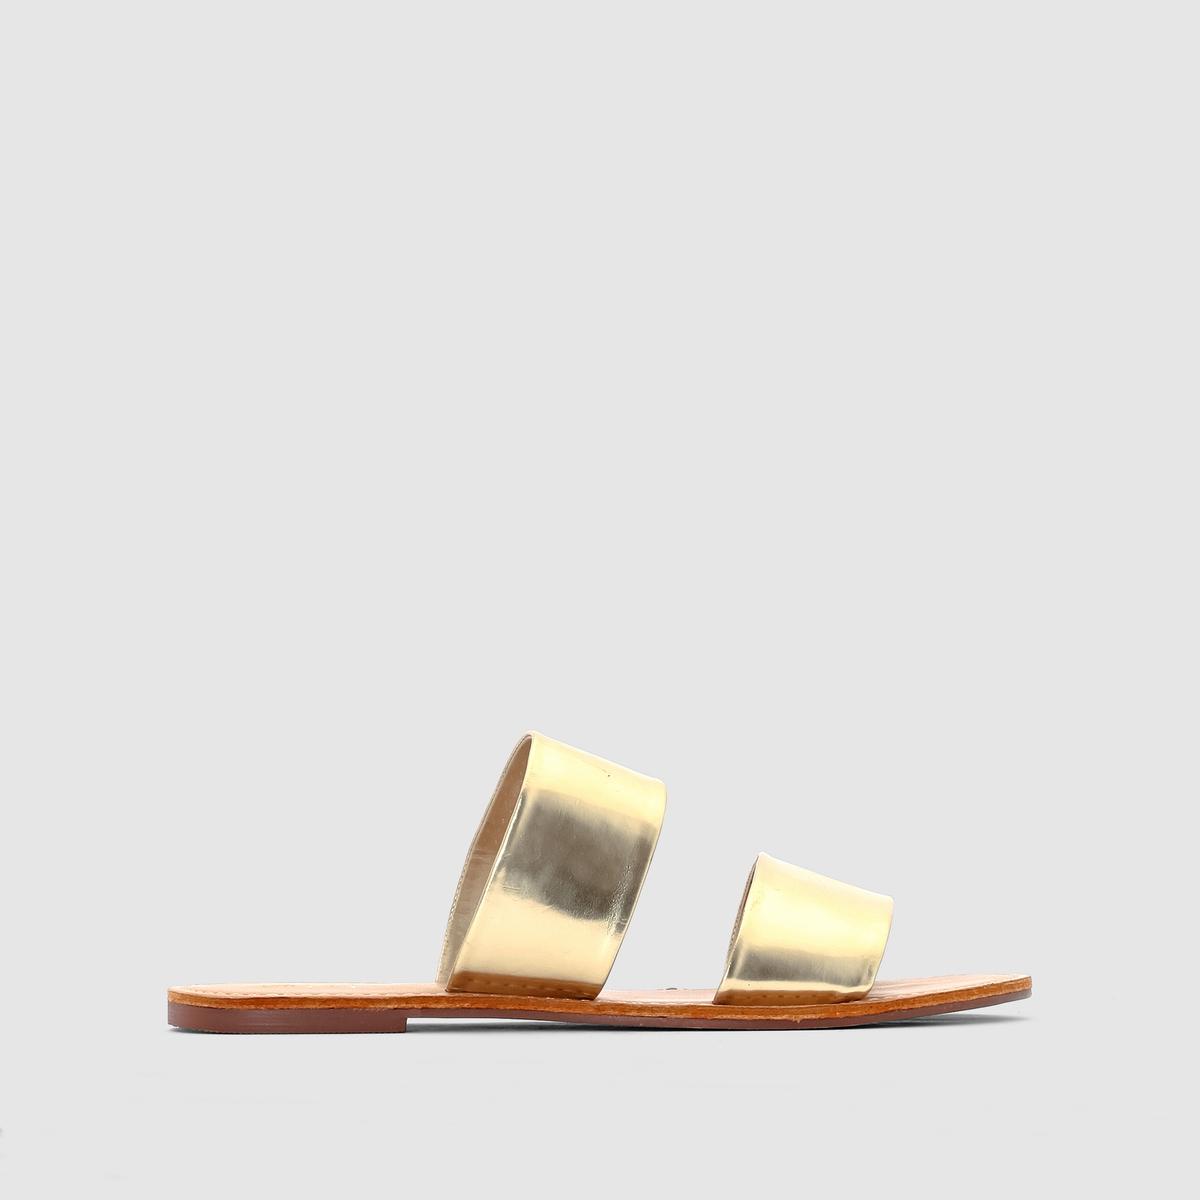 СандалииСандалии МИНИ-ЦЕНАВерх: синтетика.Подкладка: синтетика.Стелька: синтетика. Подошва: из эластомера.<br><br>Цвет: золотистый